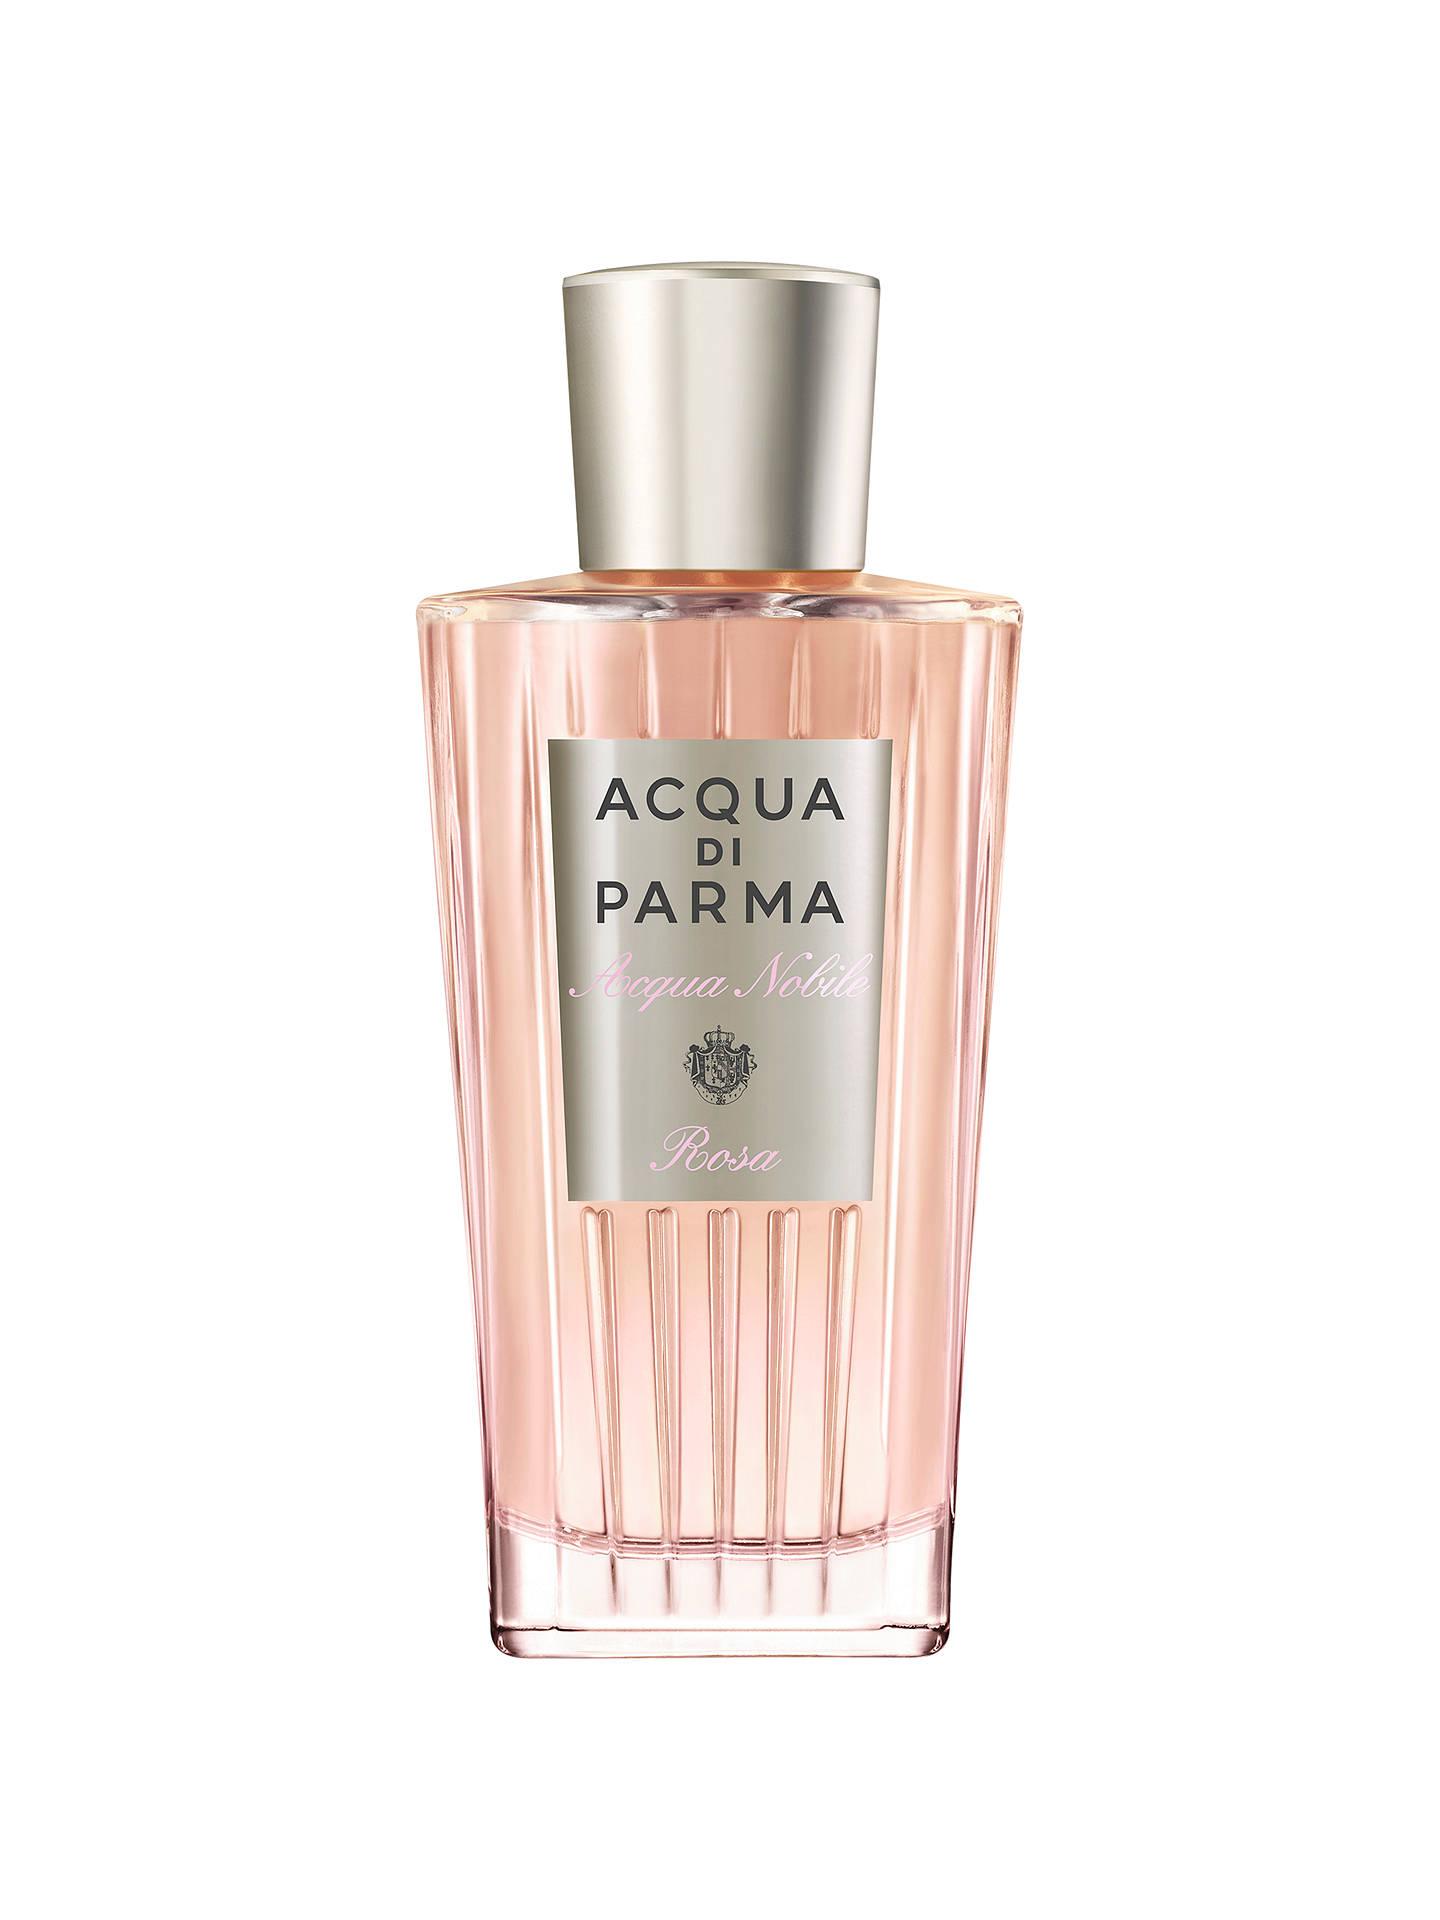 Acqua di Parma Rosa Nobile Eau de Toilette, 125ml at John..